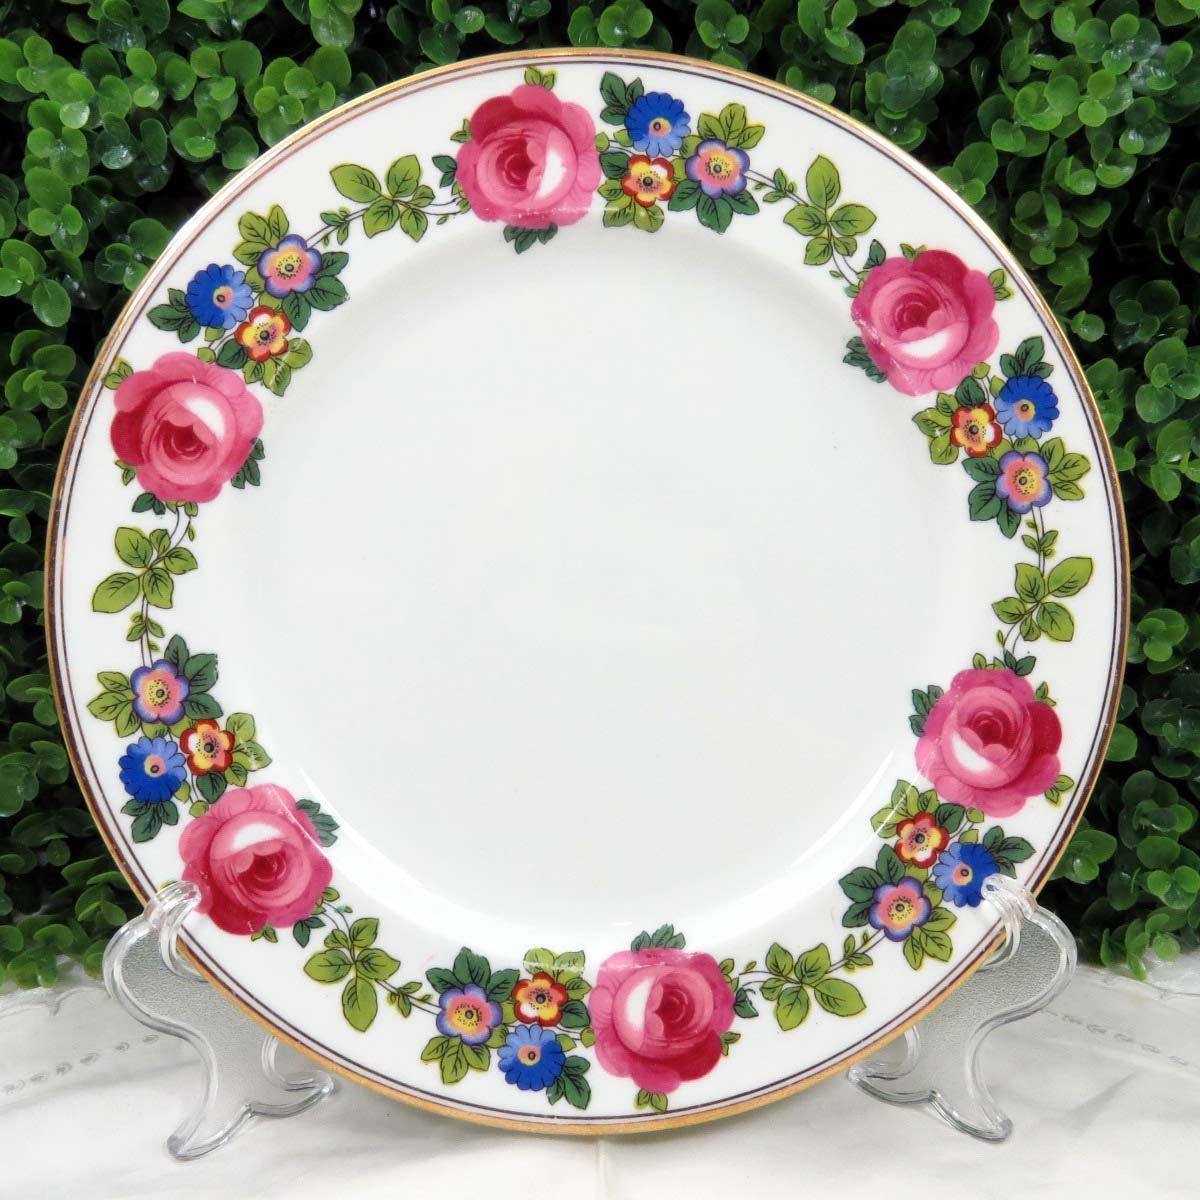 Vintage Mismatched Fine China Dinner Plates - Set of 8 - Image 5 of 12 & Vintage Mismatched Fine China Dinner Plates - Set of 8 | Chairish